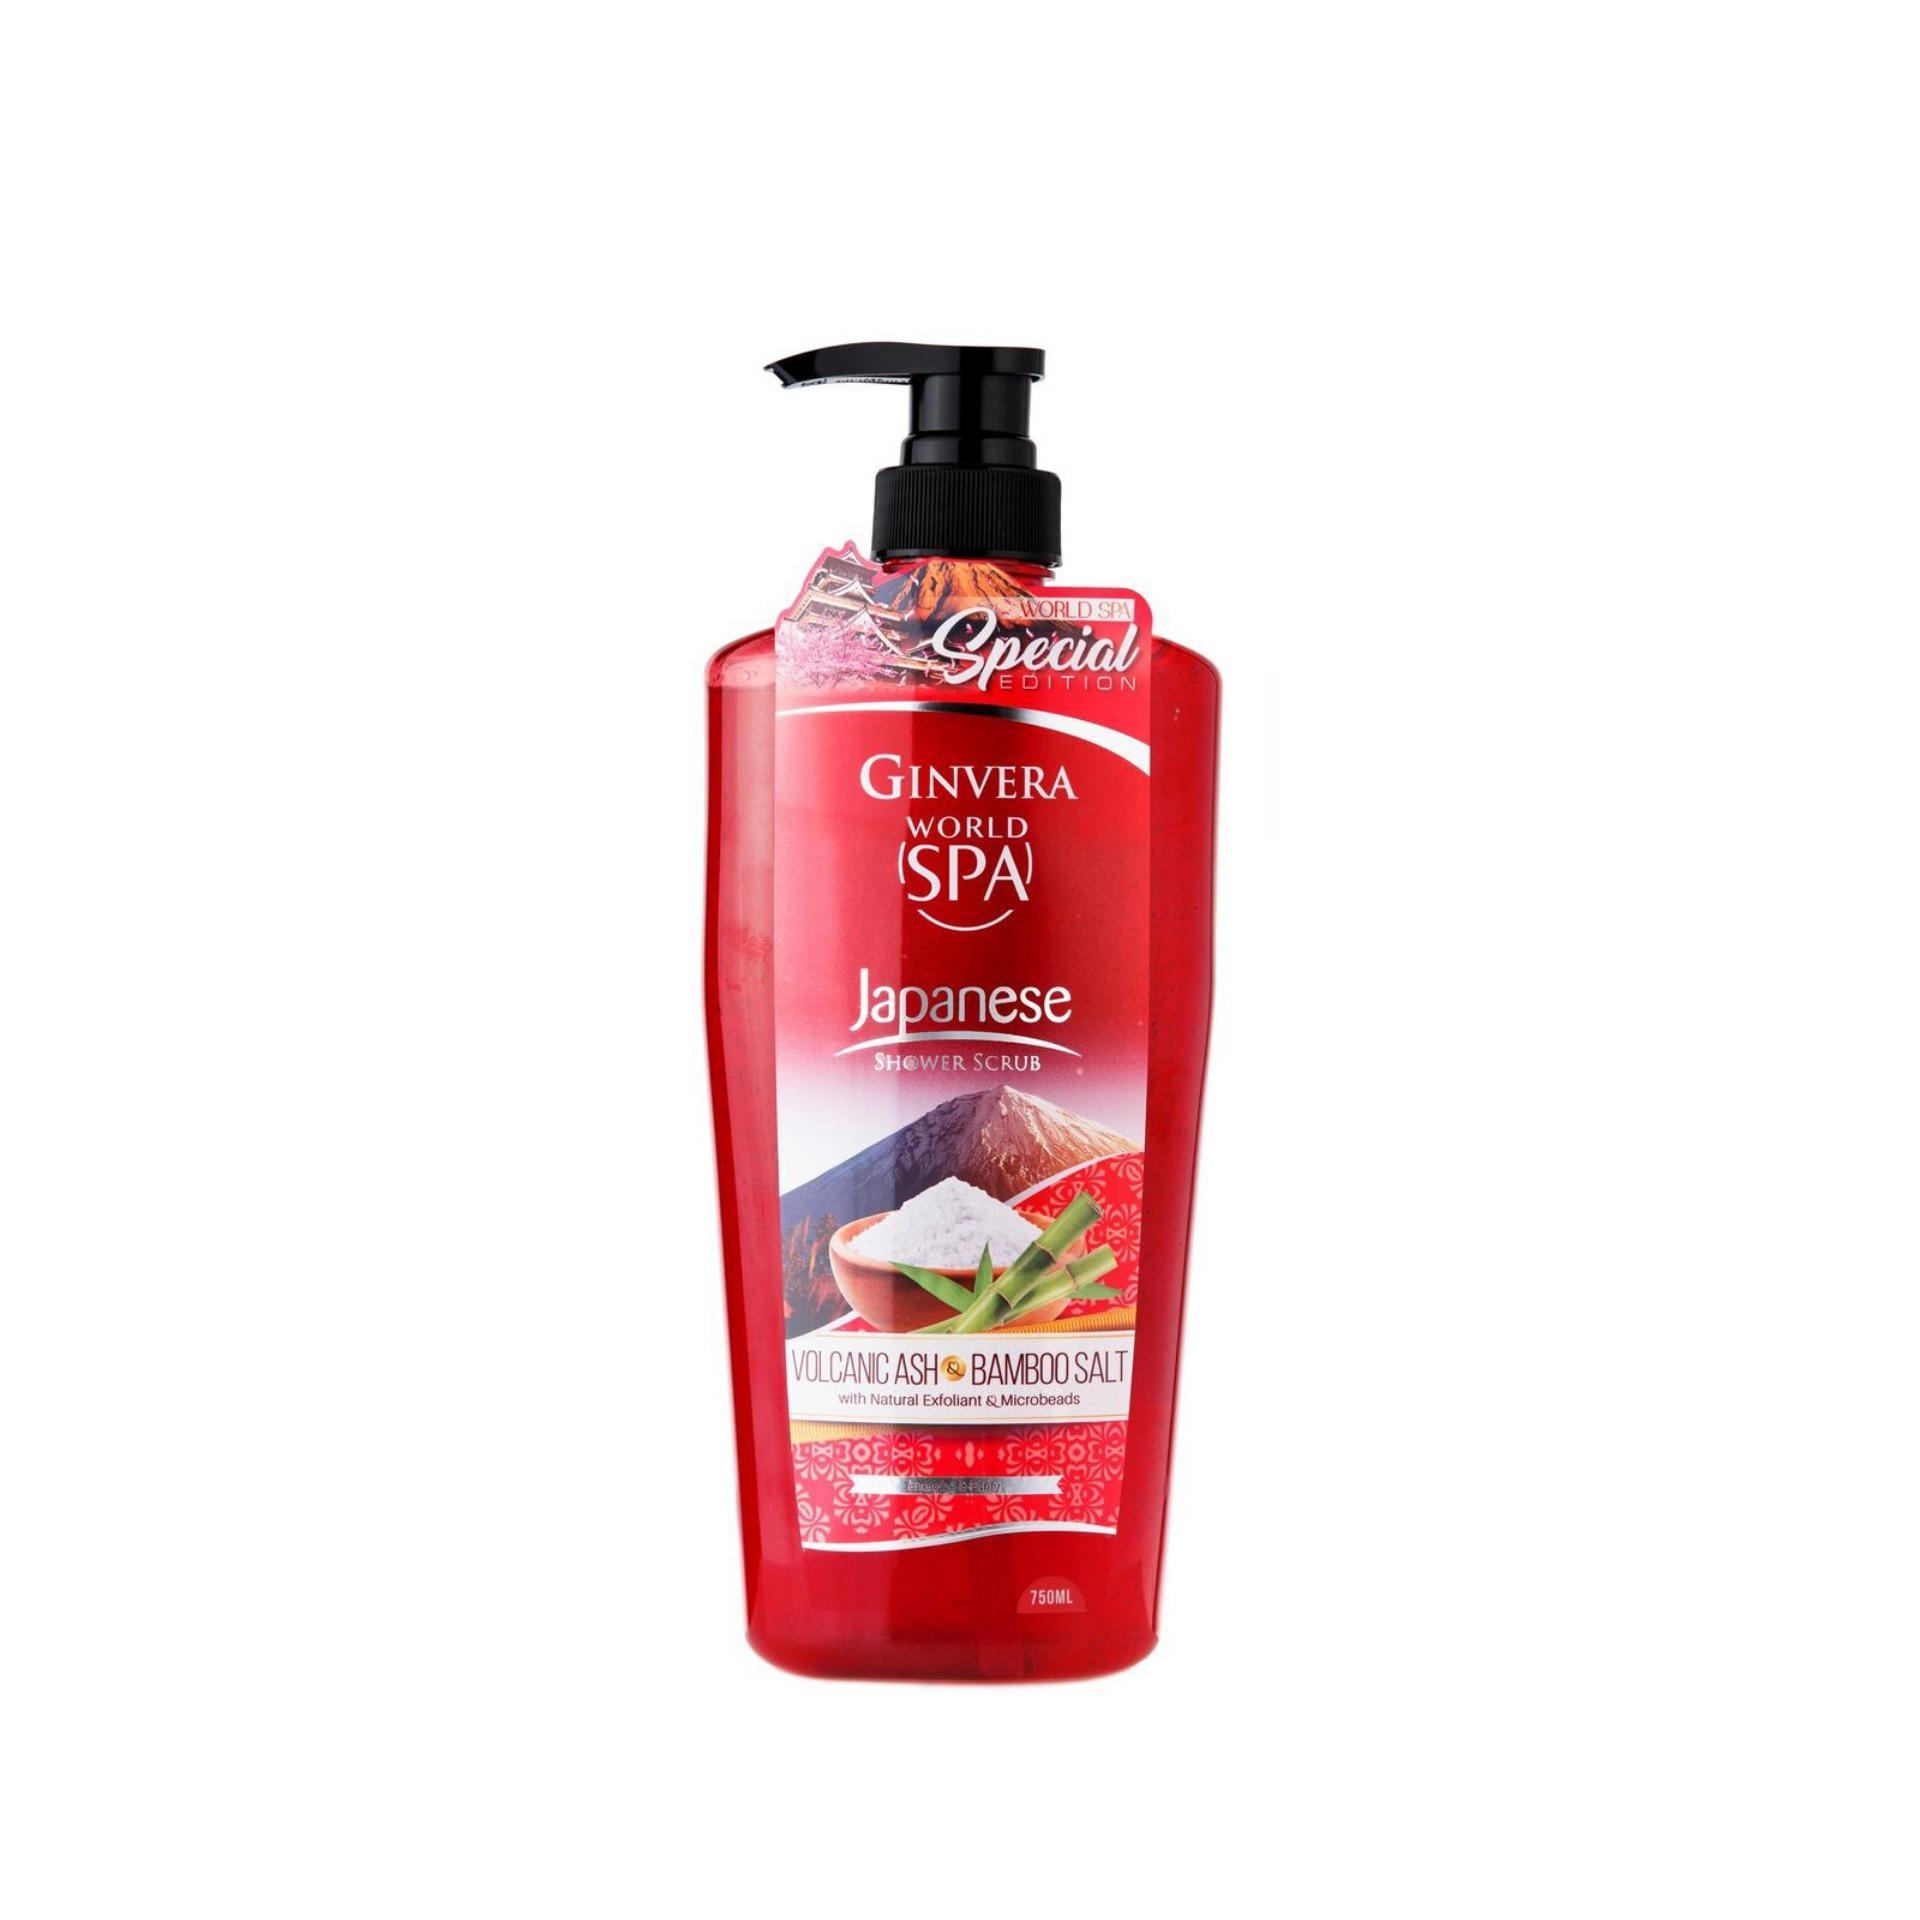 Ginvera World Spa Japanese Volcanic Ash & Bamboo Salt Shower Scrub 750ml